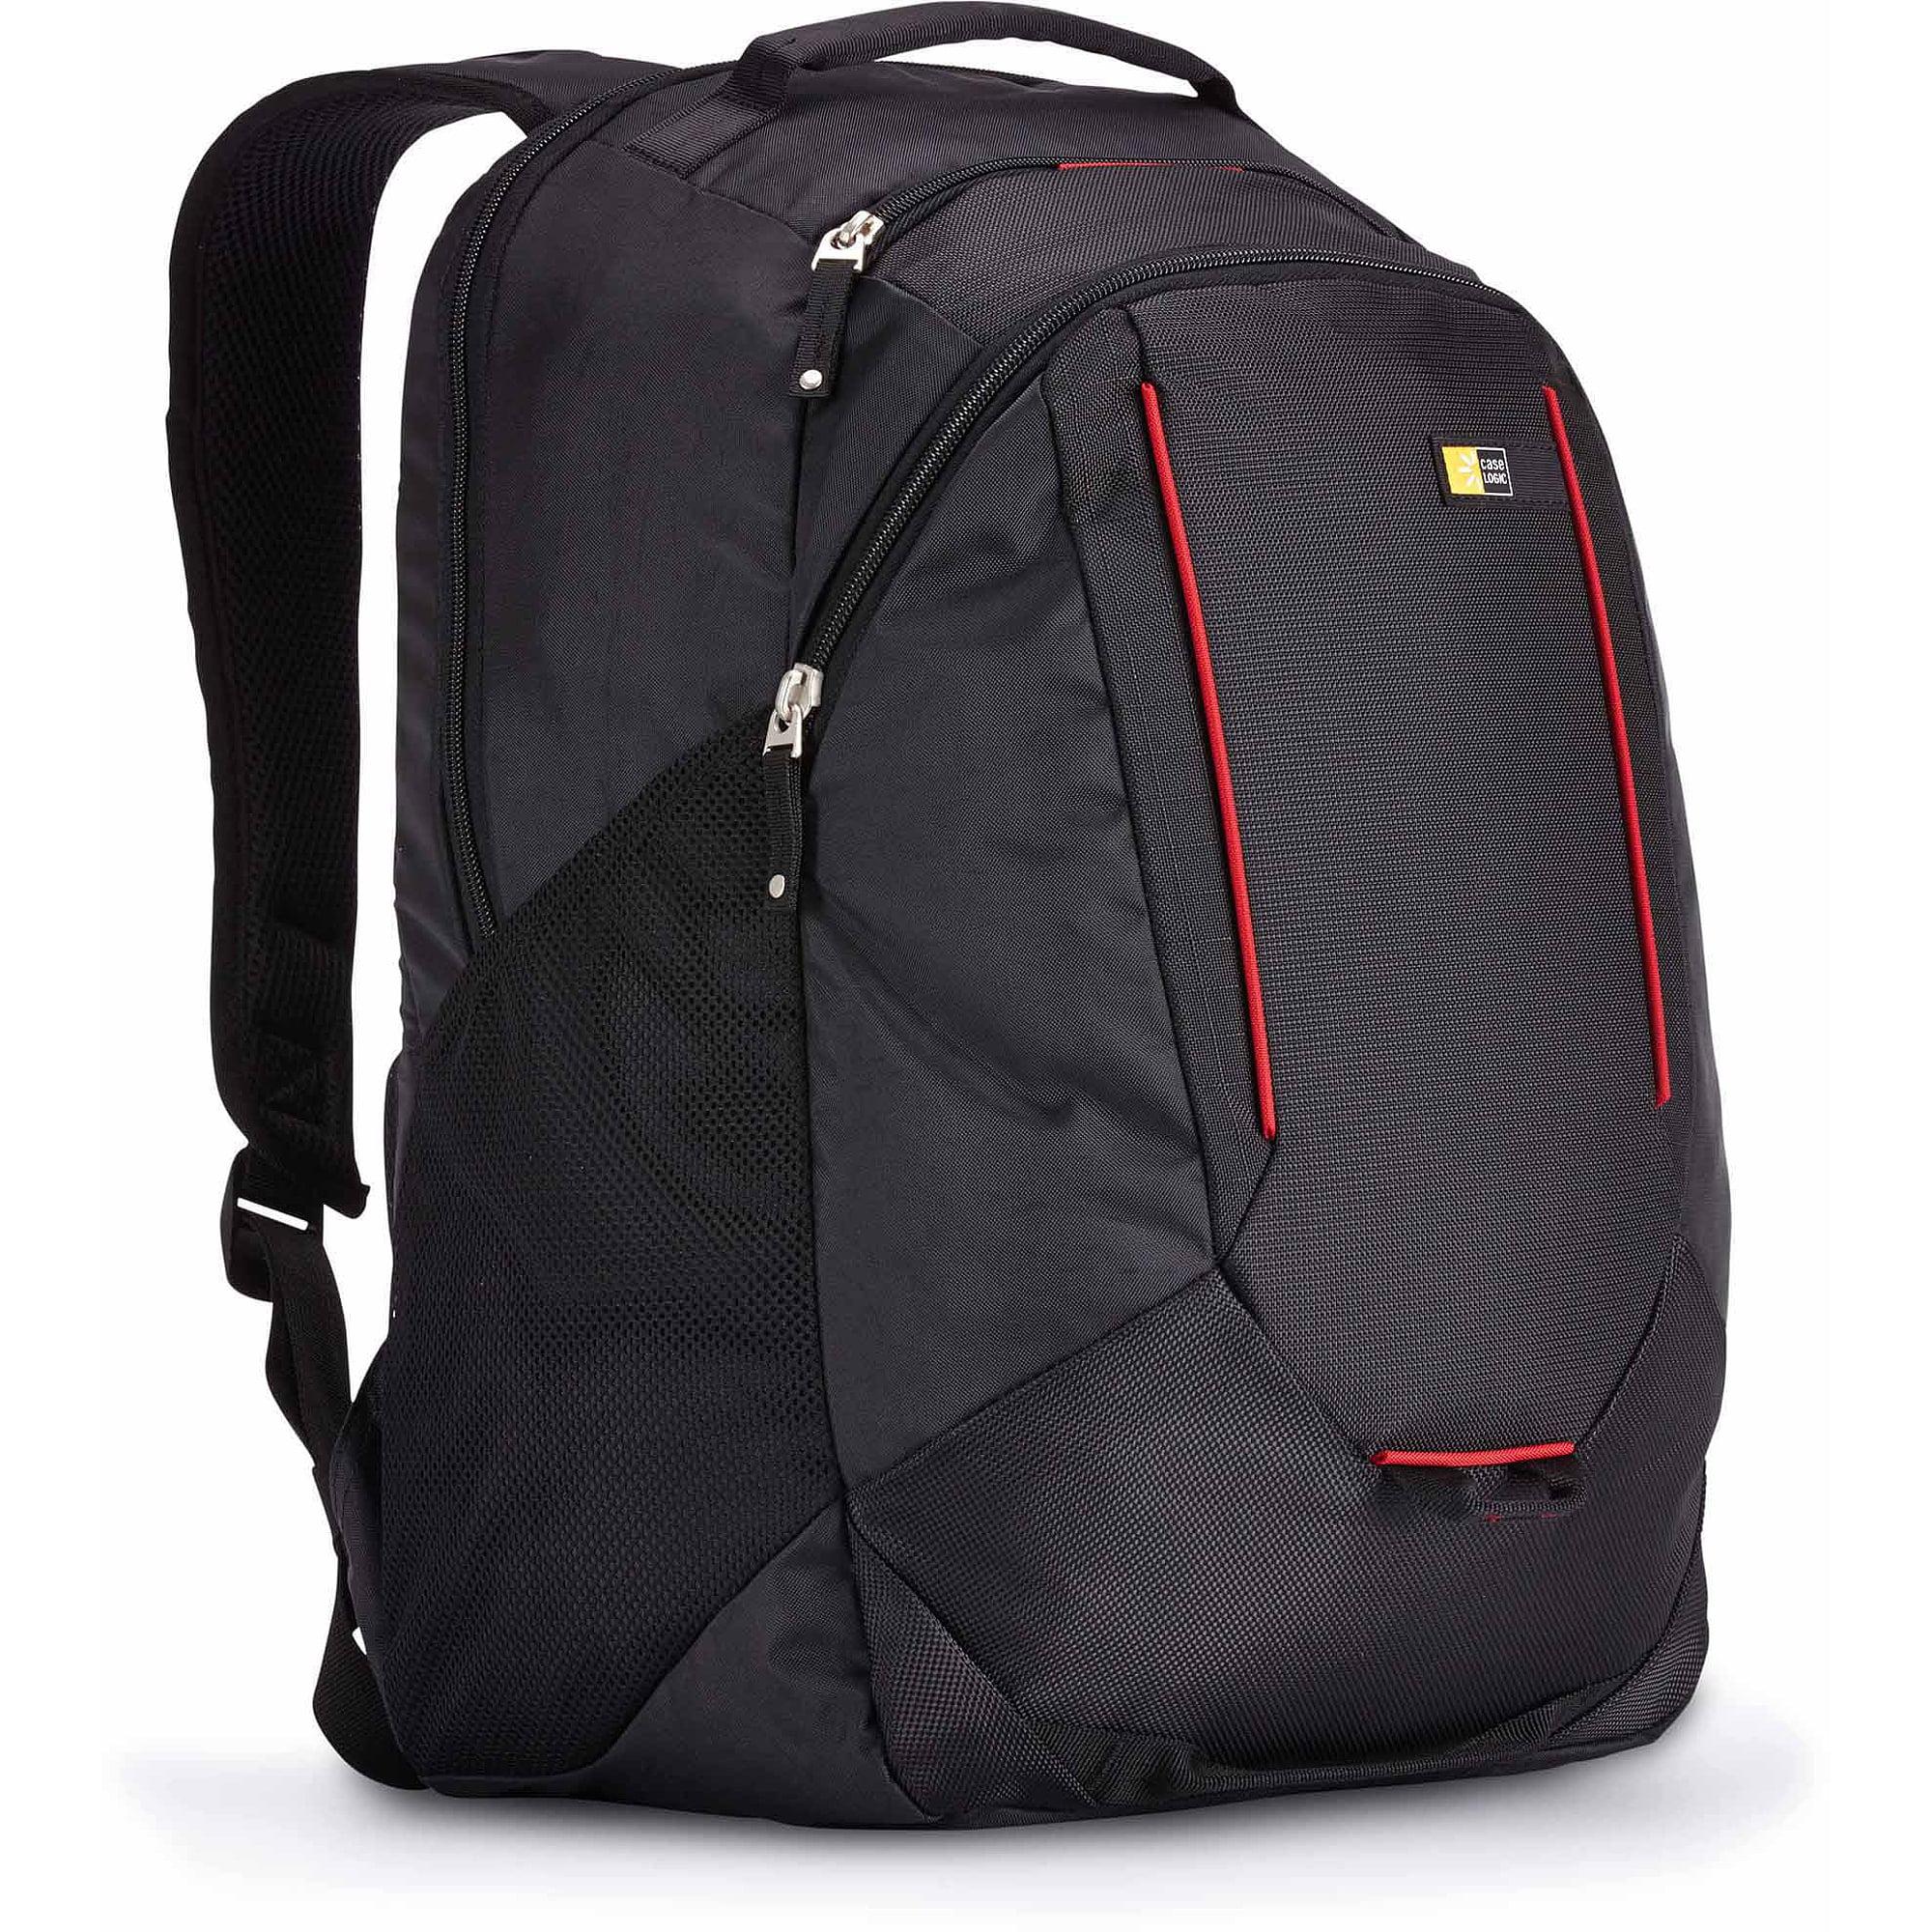 Case Logic BPEB-115 Evolution Laptop Backpack with Lumbar Padding and Grab Handles, Black